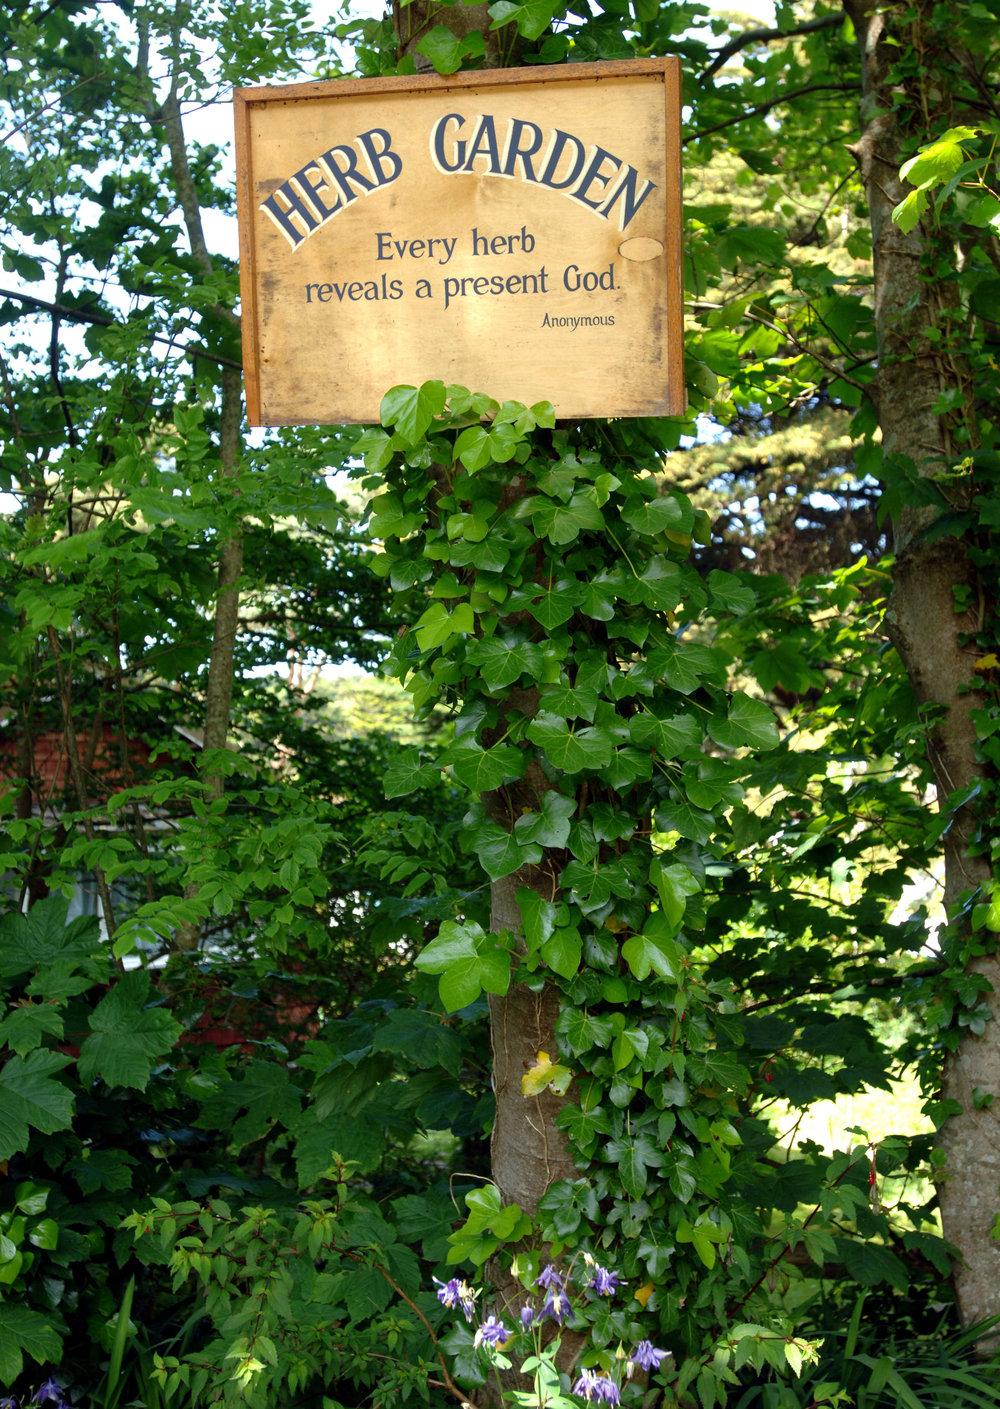 Caldey herb garden sign.jpg